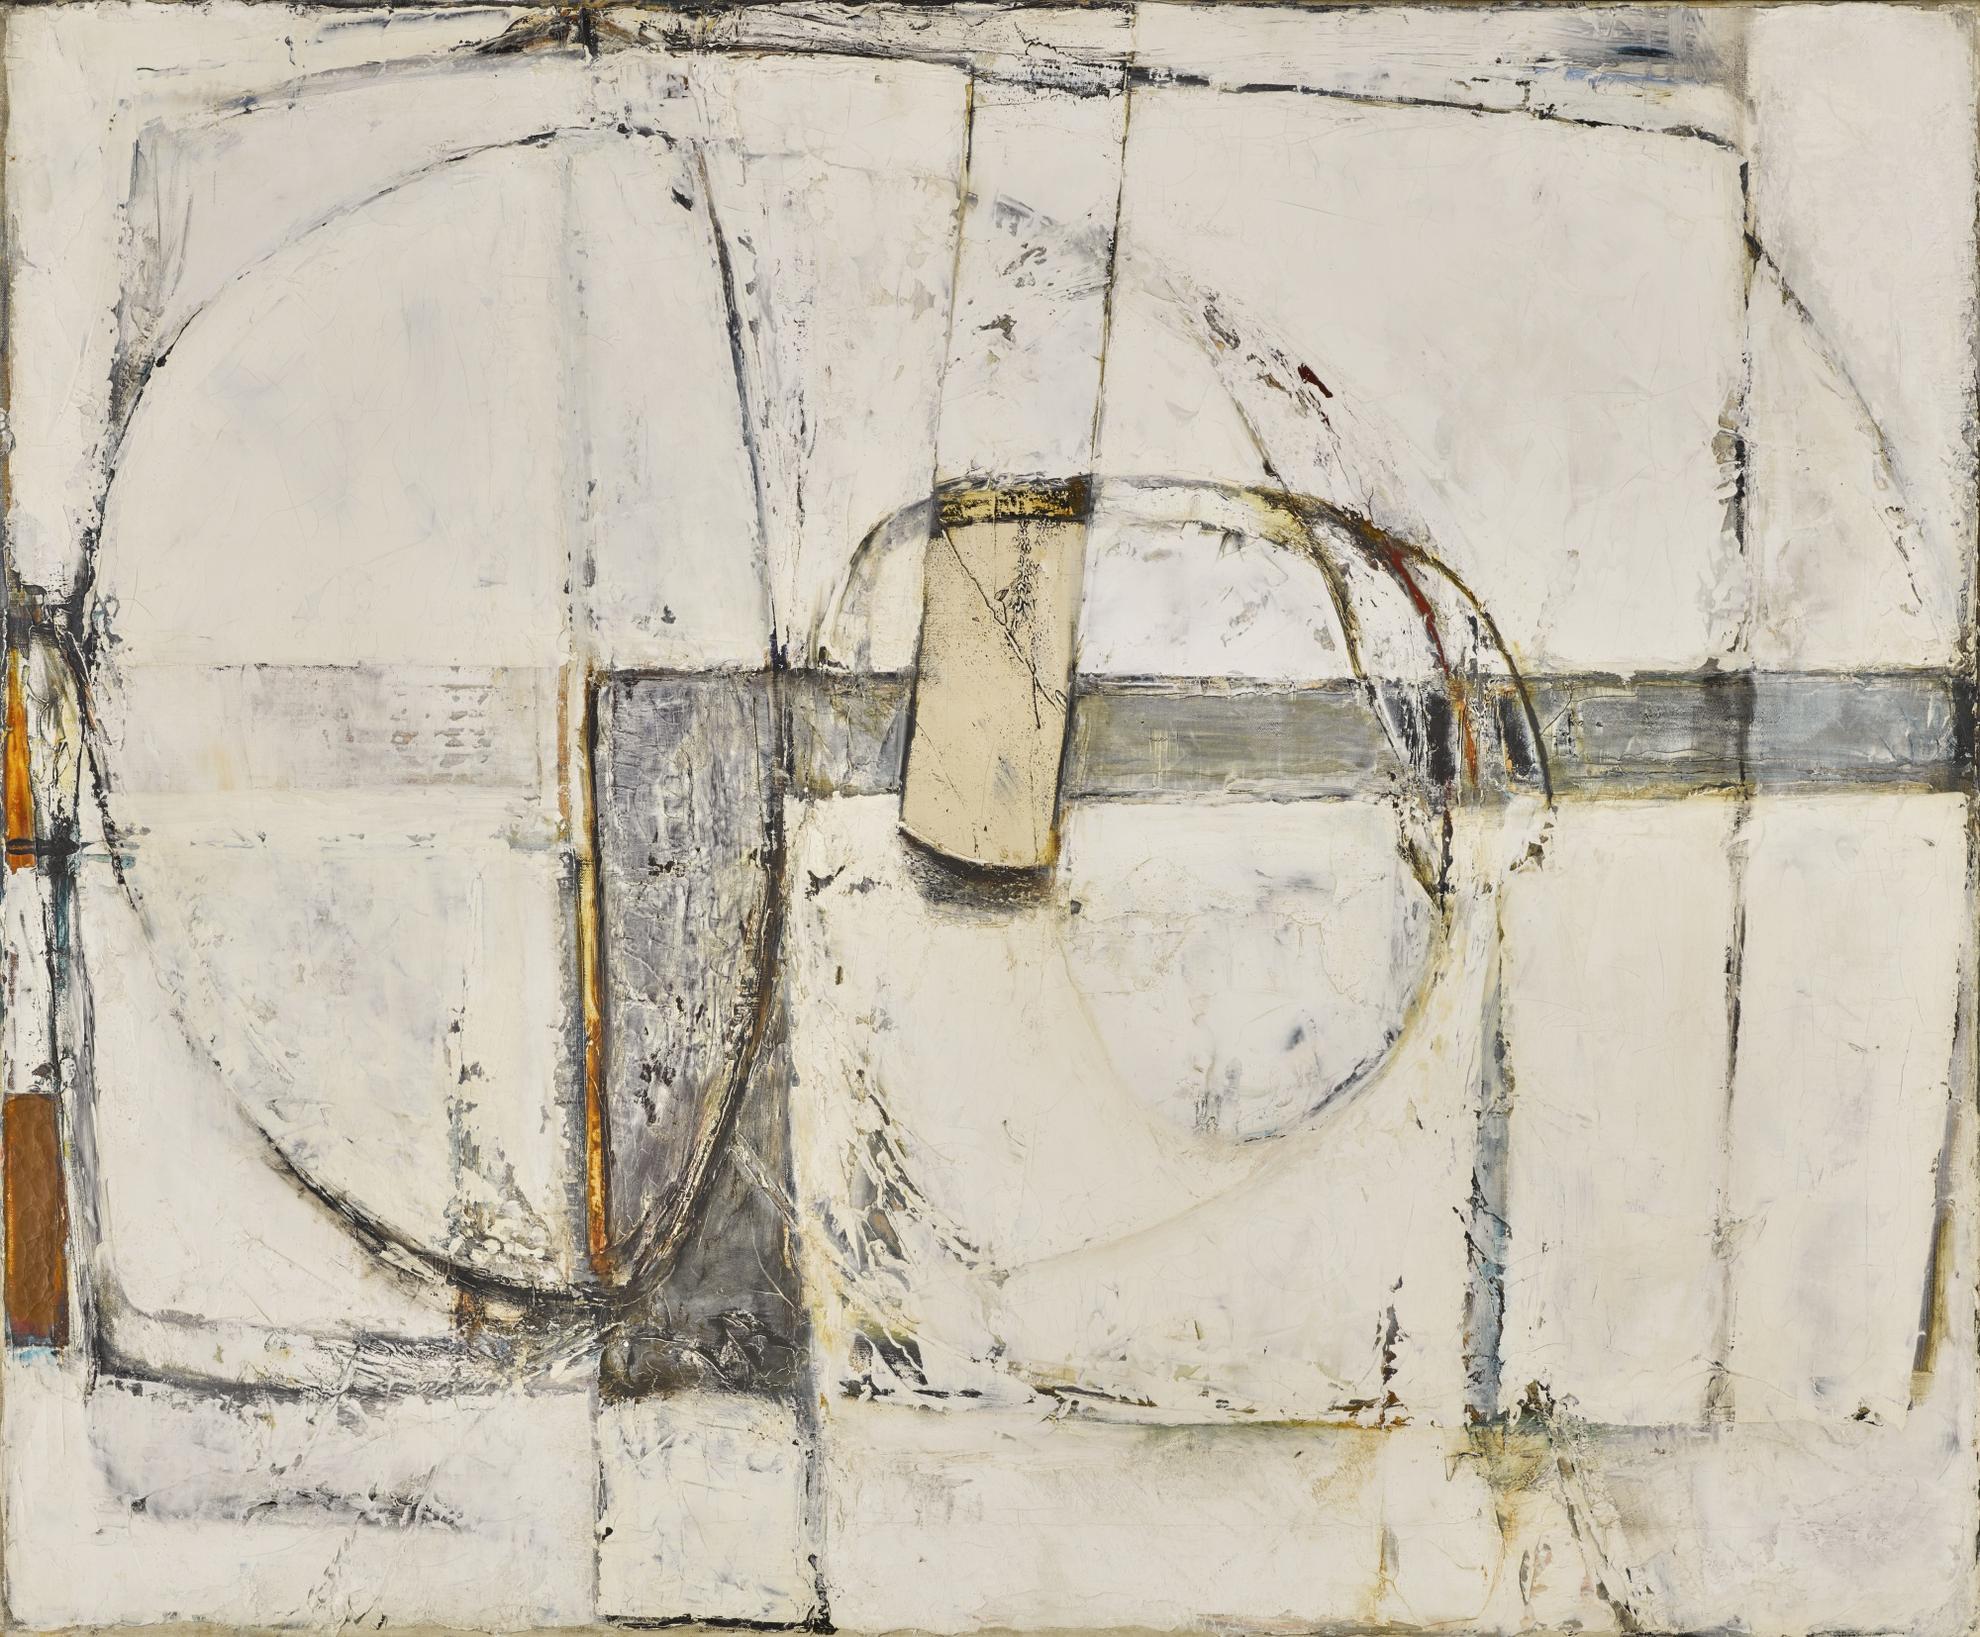 Paul Feiler-Linear Forms-1964